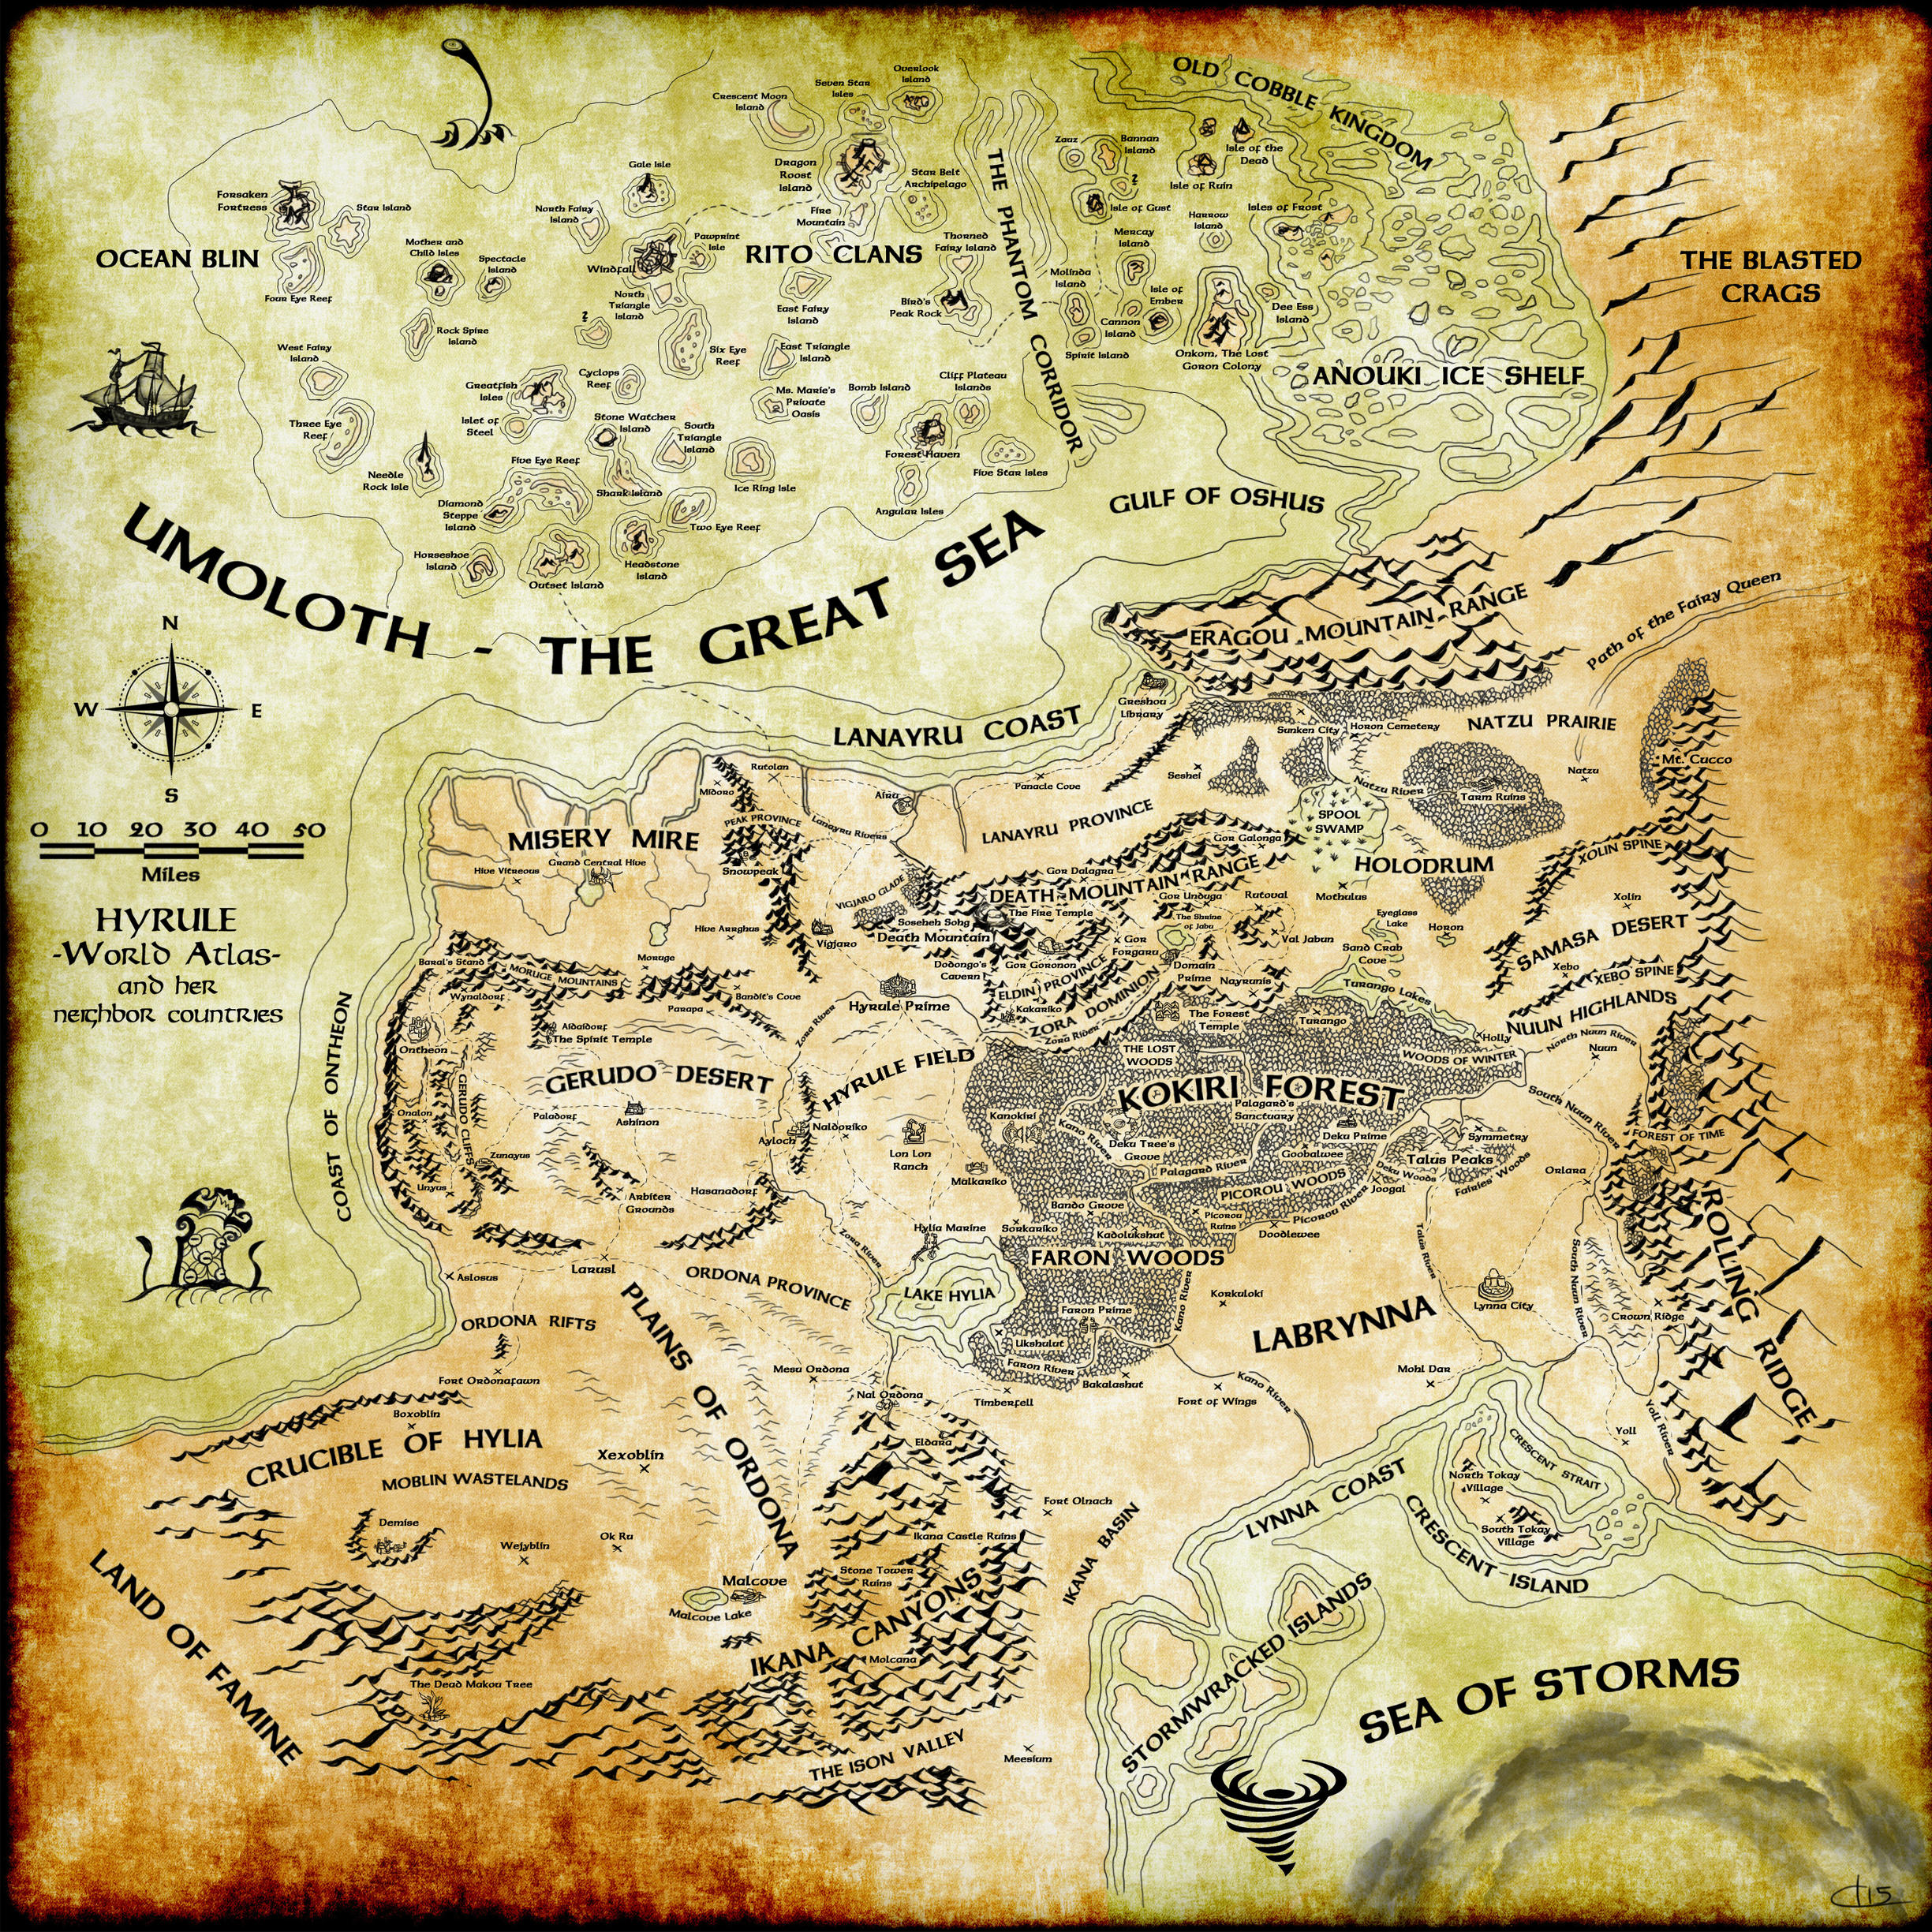 Hyrule World Atlas by UndyingNephalim